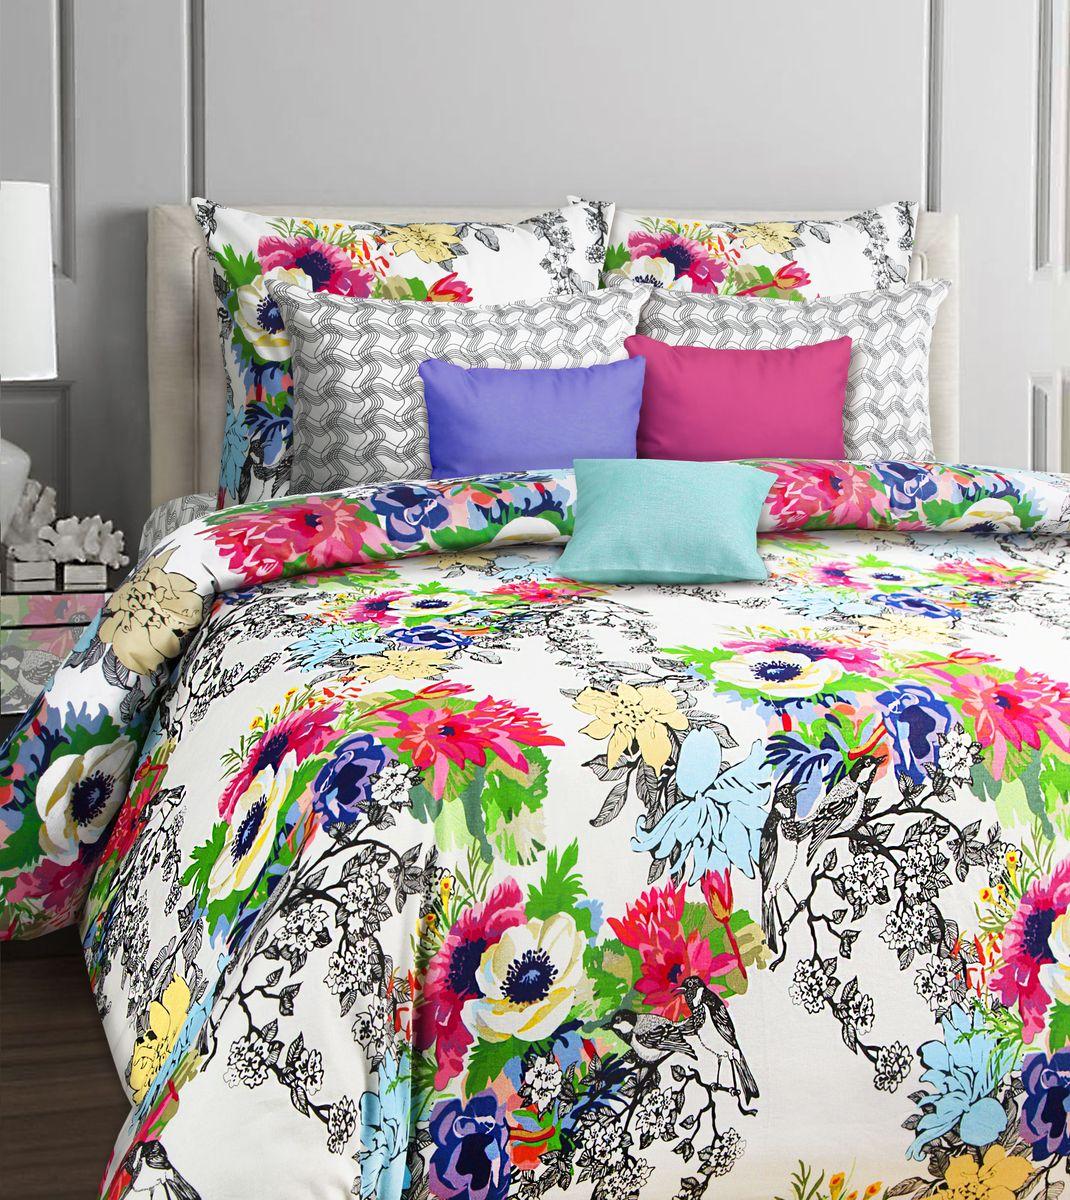 Комплект белья Mona Liza Classik. Glamour, 2-спальный, наволочки 50х70 morse taper holder bt50 mtb2 135